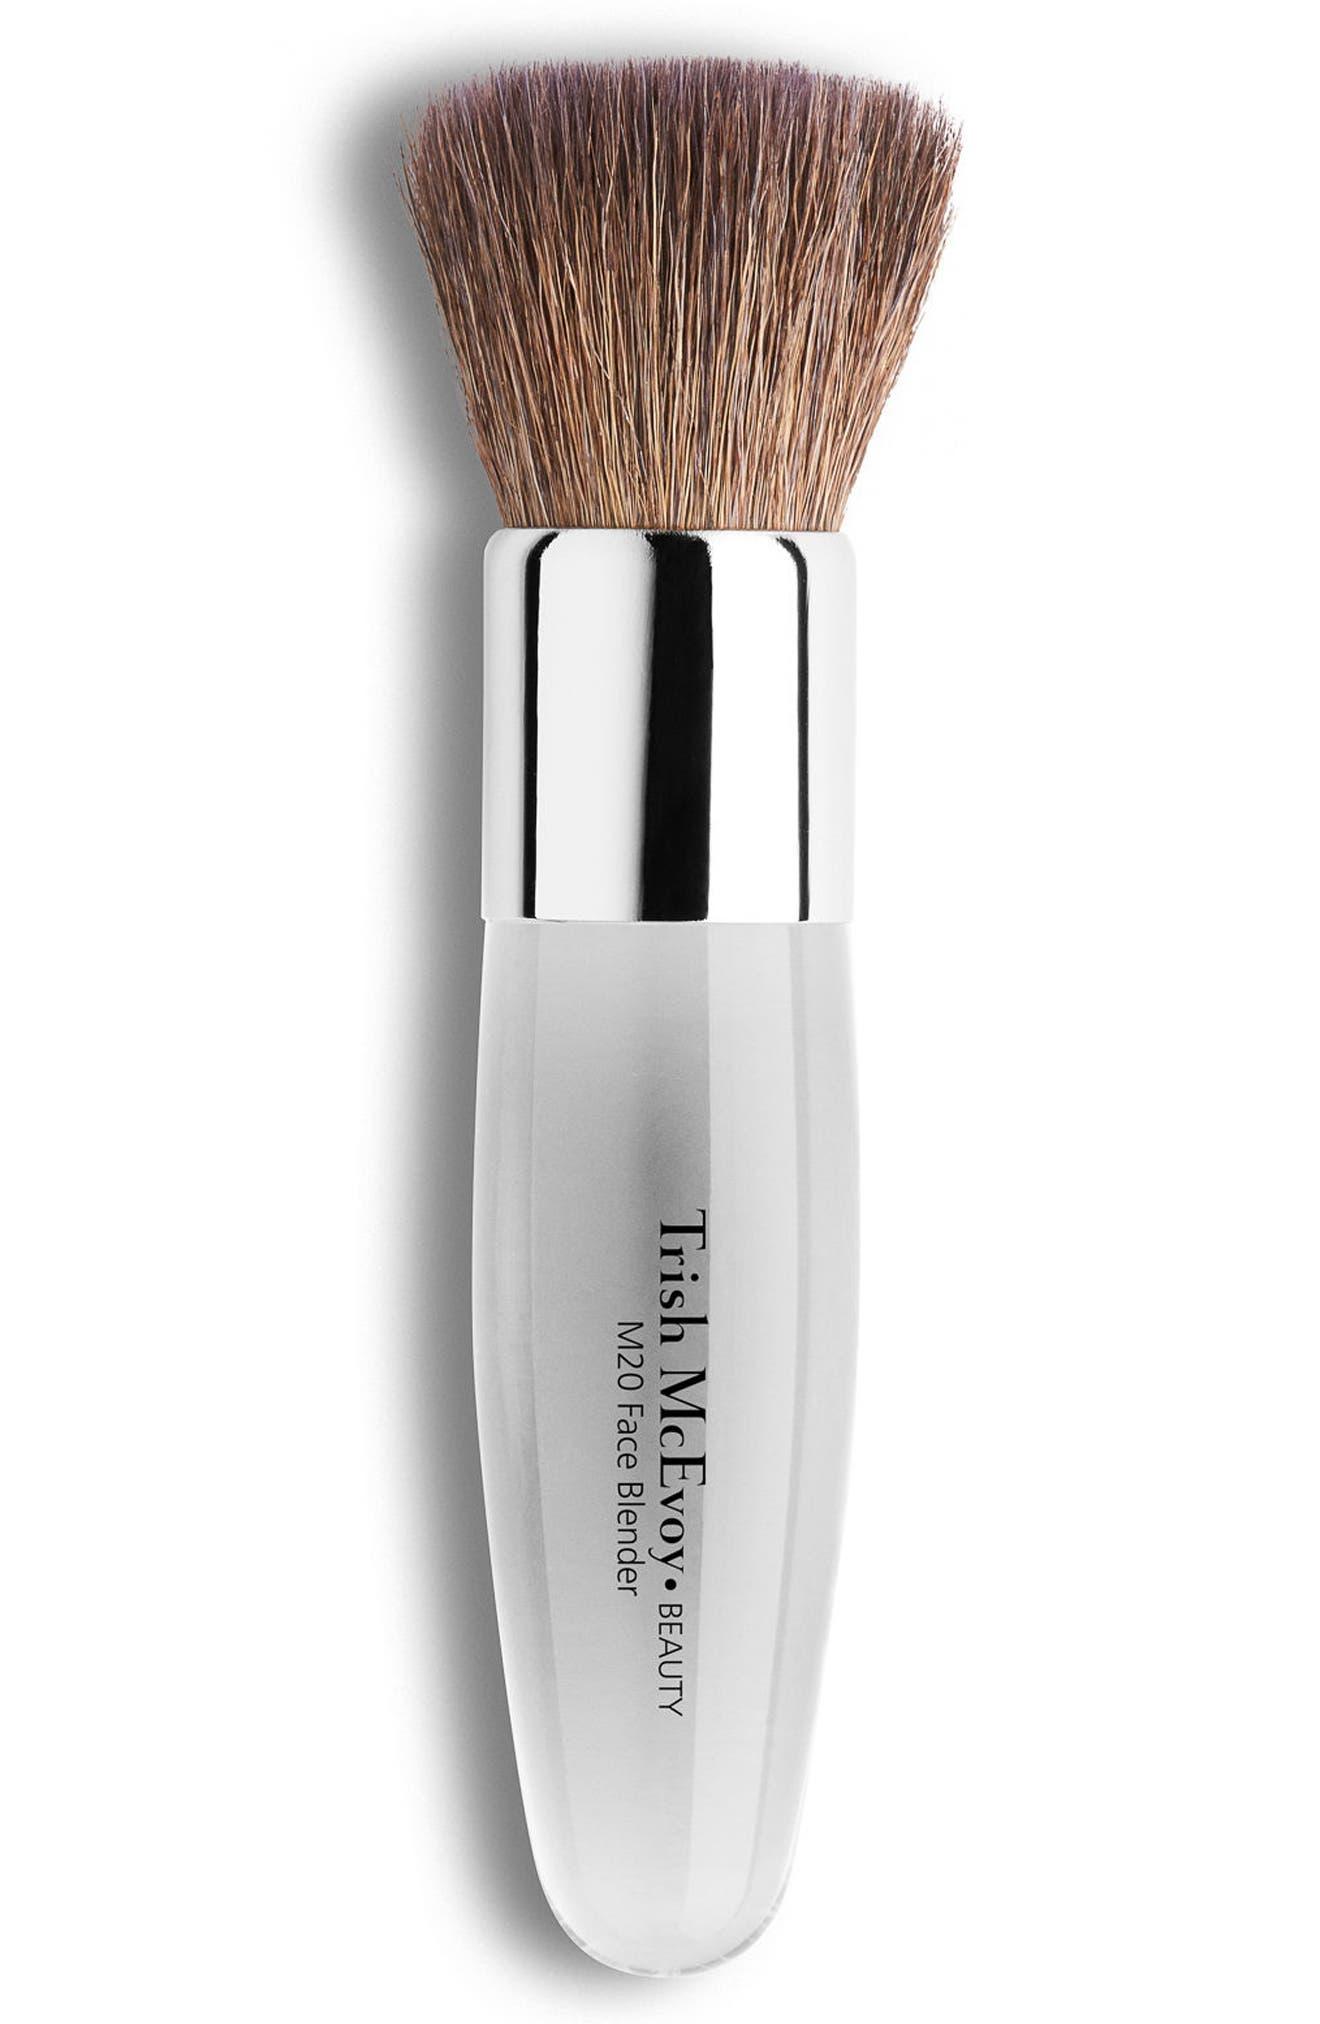 Trish McEvoy #M20 Face Blender Brush